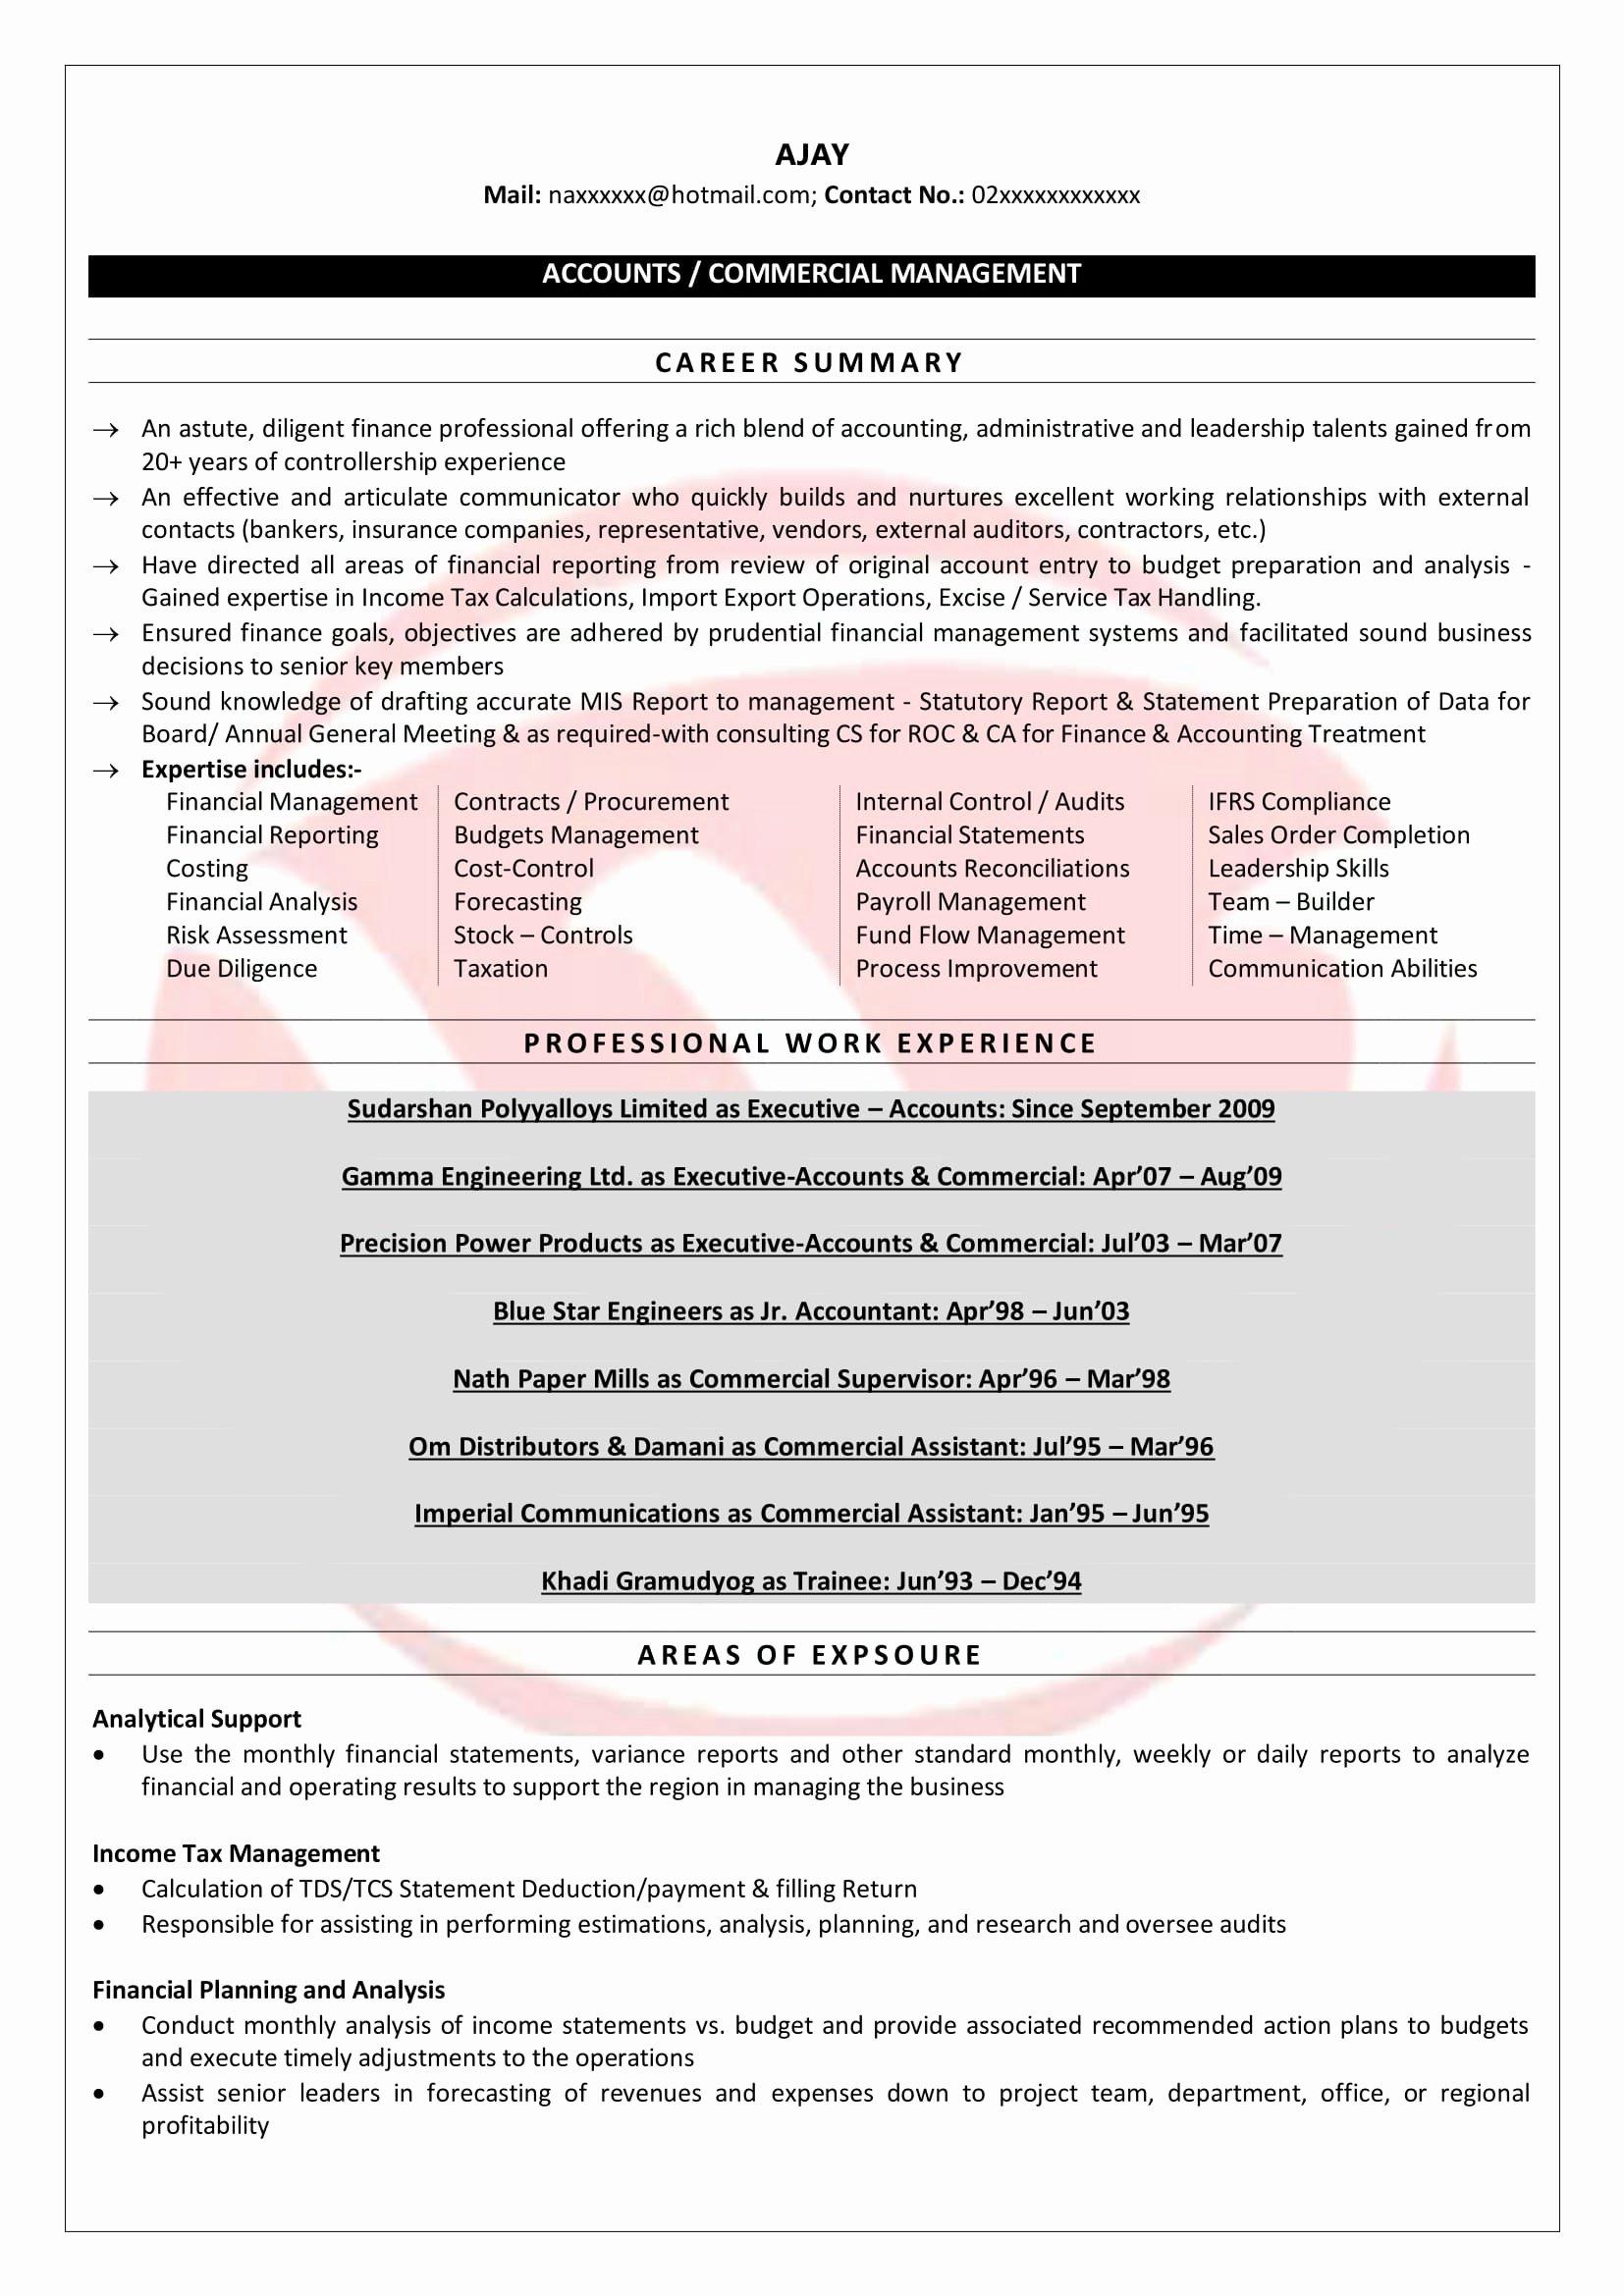 Senior Accountant Resume Sample Elegant Senior Accountant Sample Resumes Download Resume format Templates